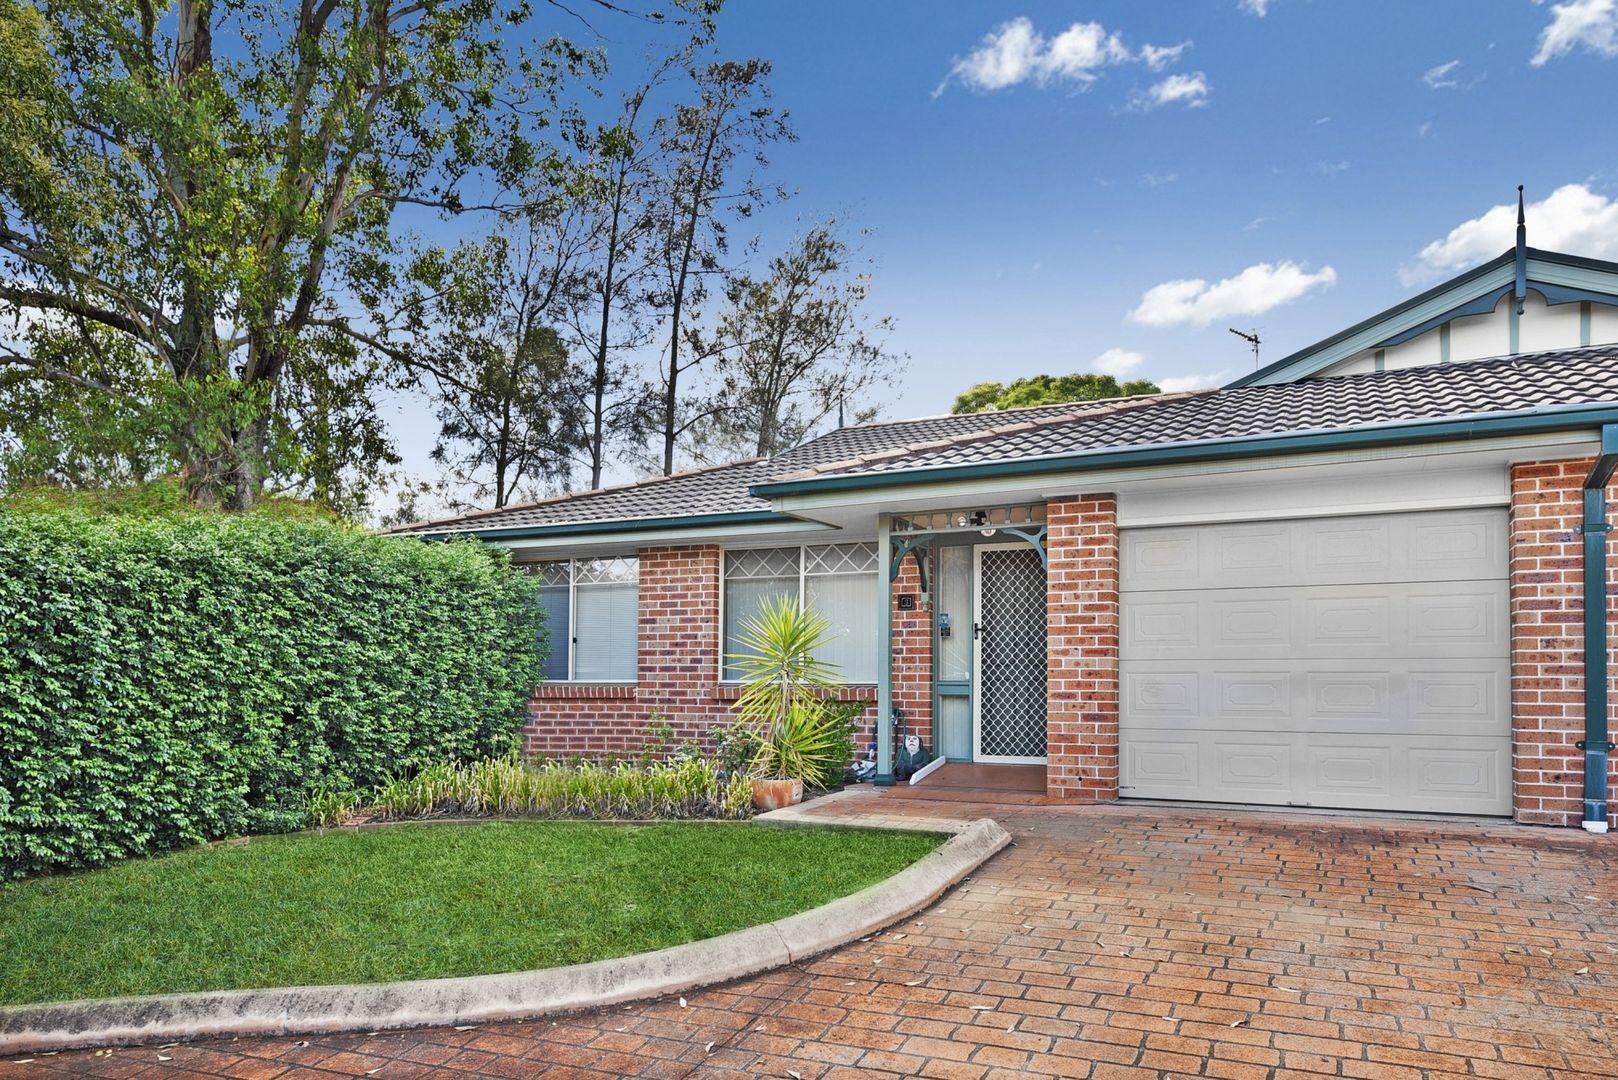 3/132 Coreen Avenue, Penrith NSW 2750, Image 0